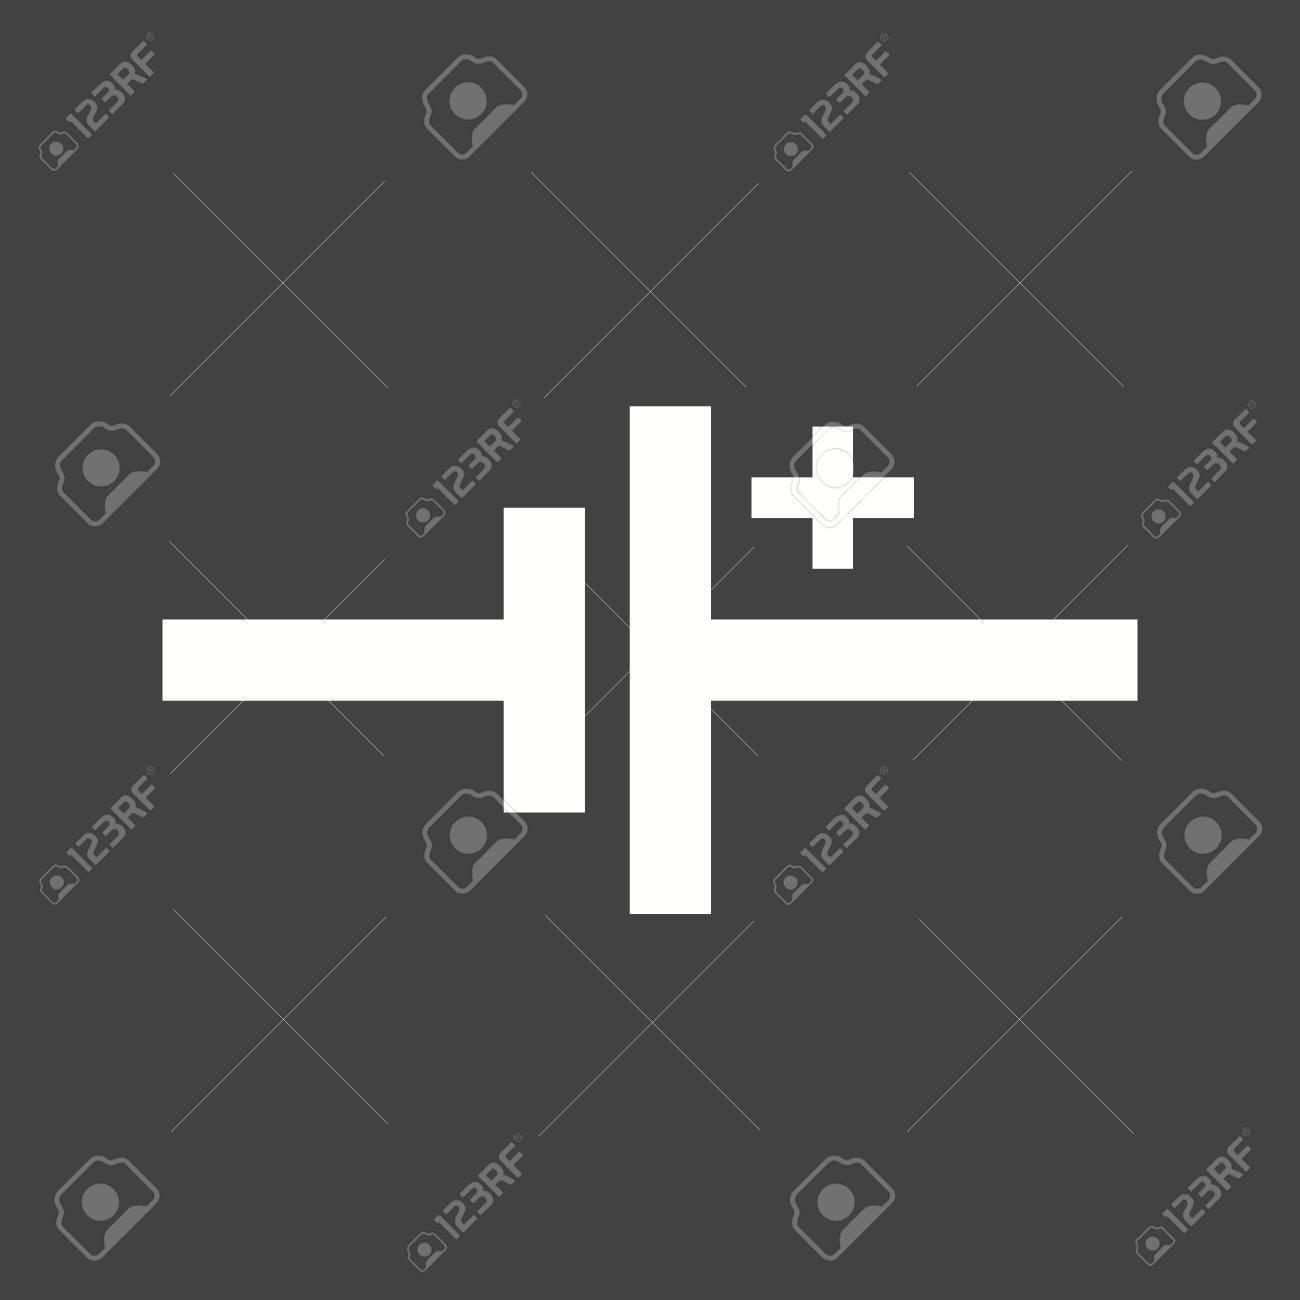 Tolle Symbol Dc Fotos - Der Schaltplan - raydavisrealtor.info